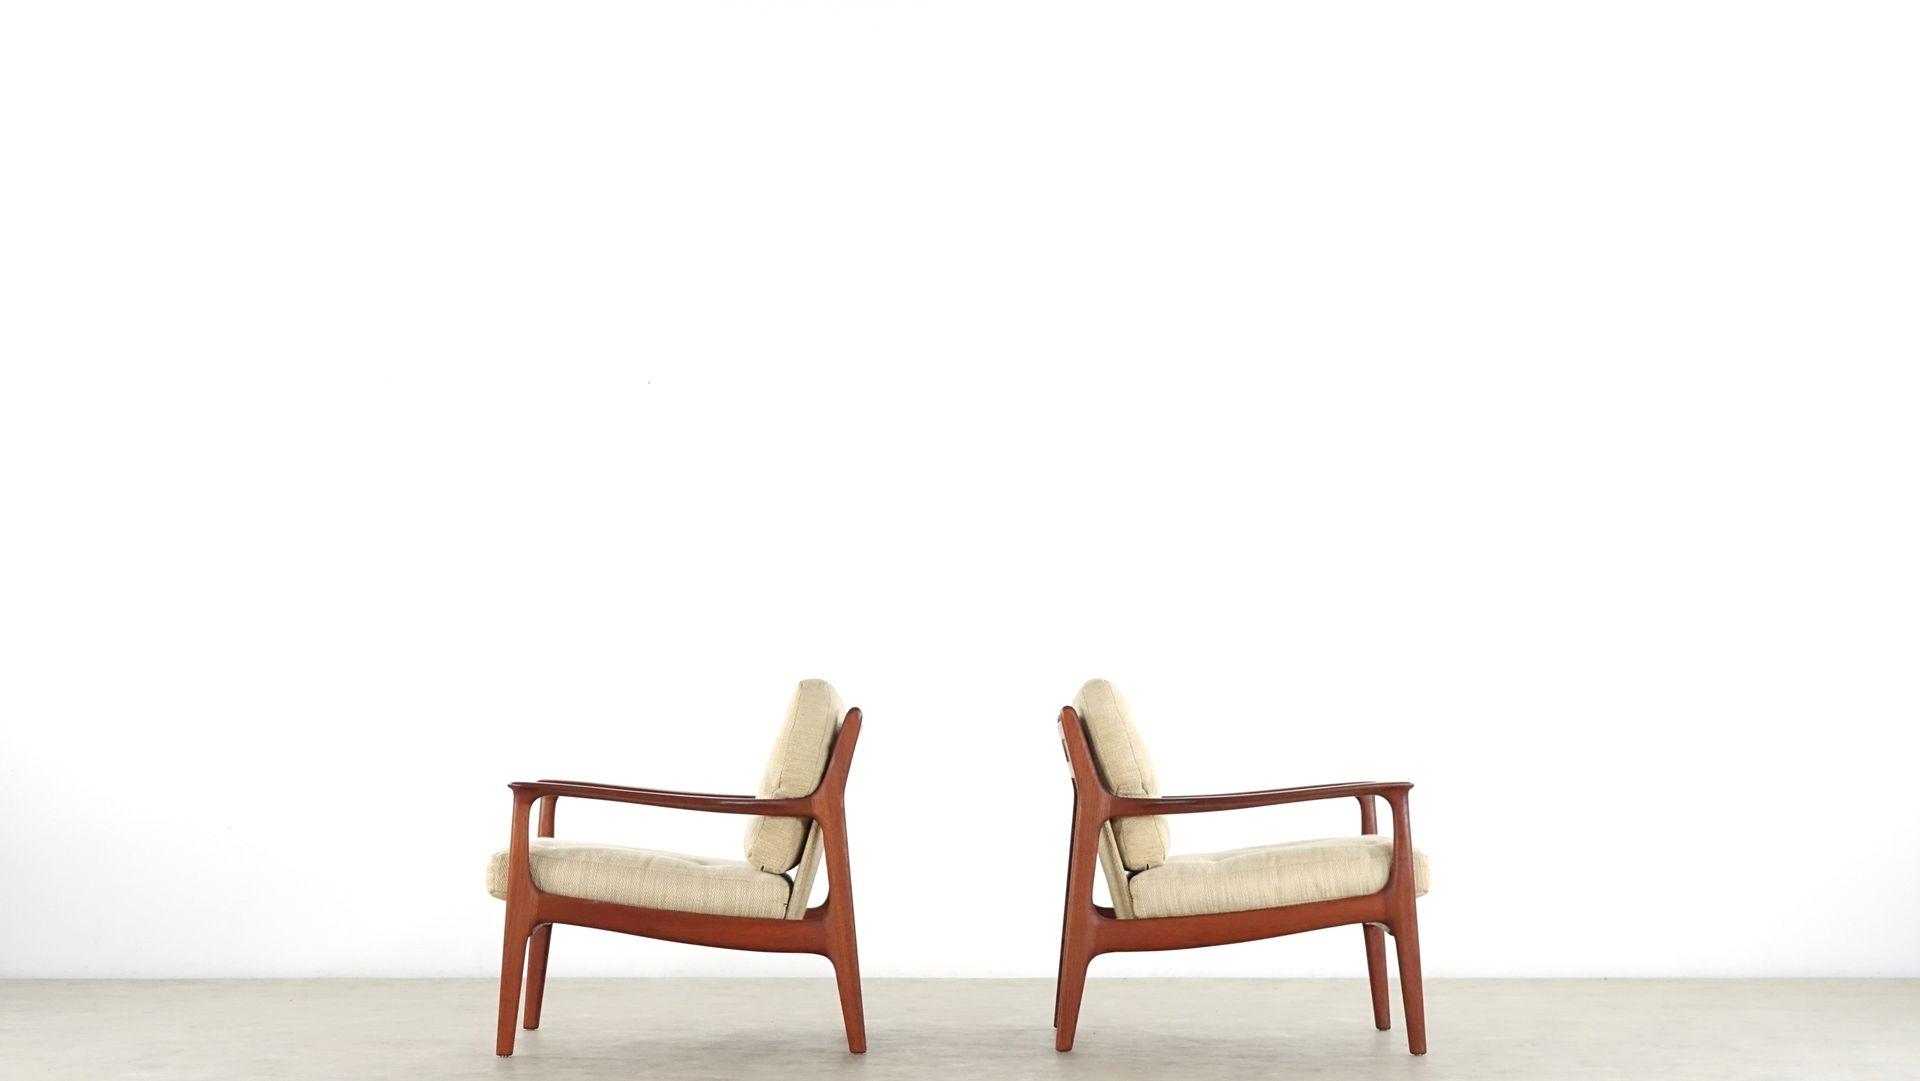 Chaise schmidt perfect chaise schmidt with chaise schmidt for Tabouret bar schmidt